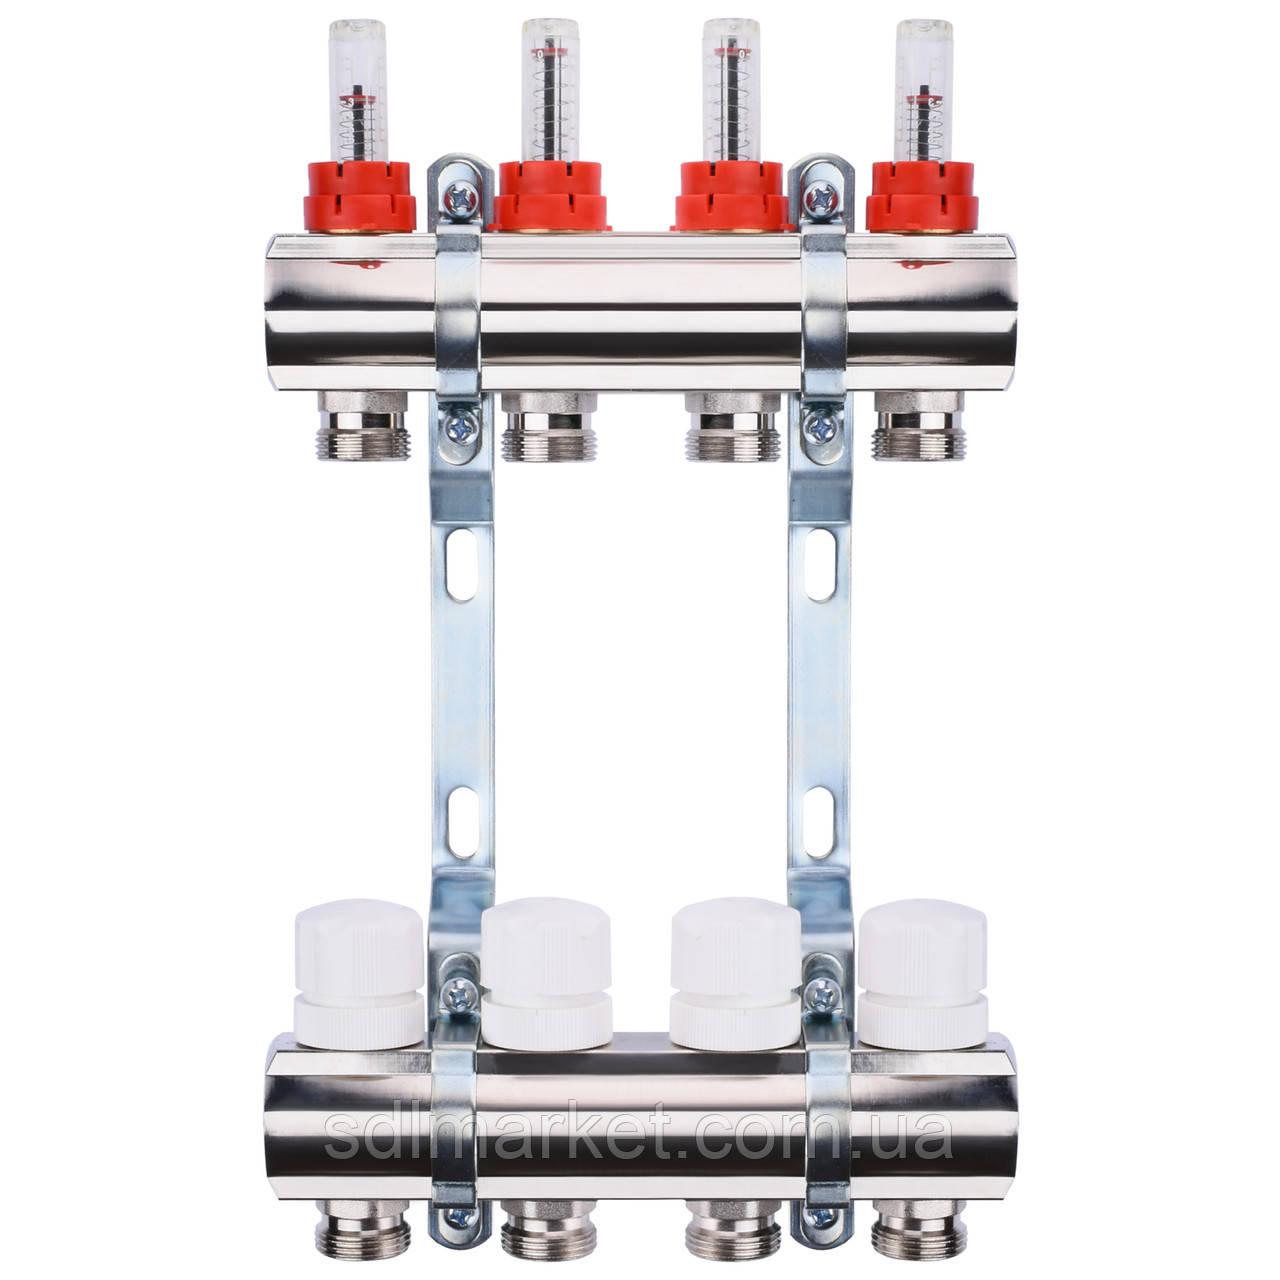 "Коллектор с расходомерами, регуляторами и креплением ECO 001A 1""x4"